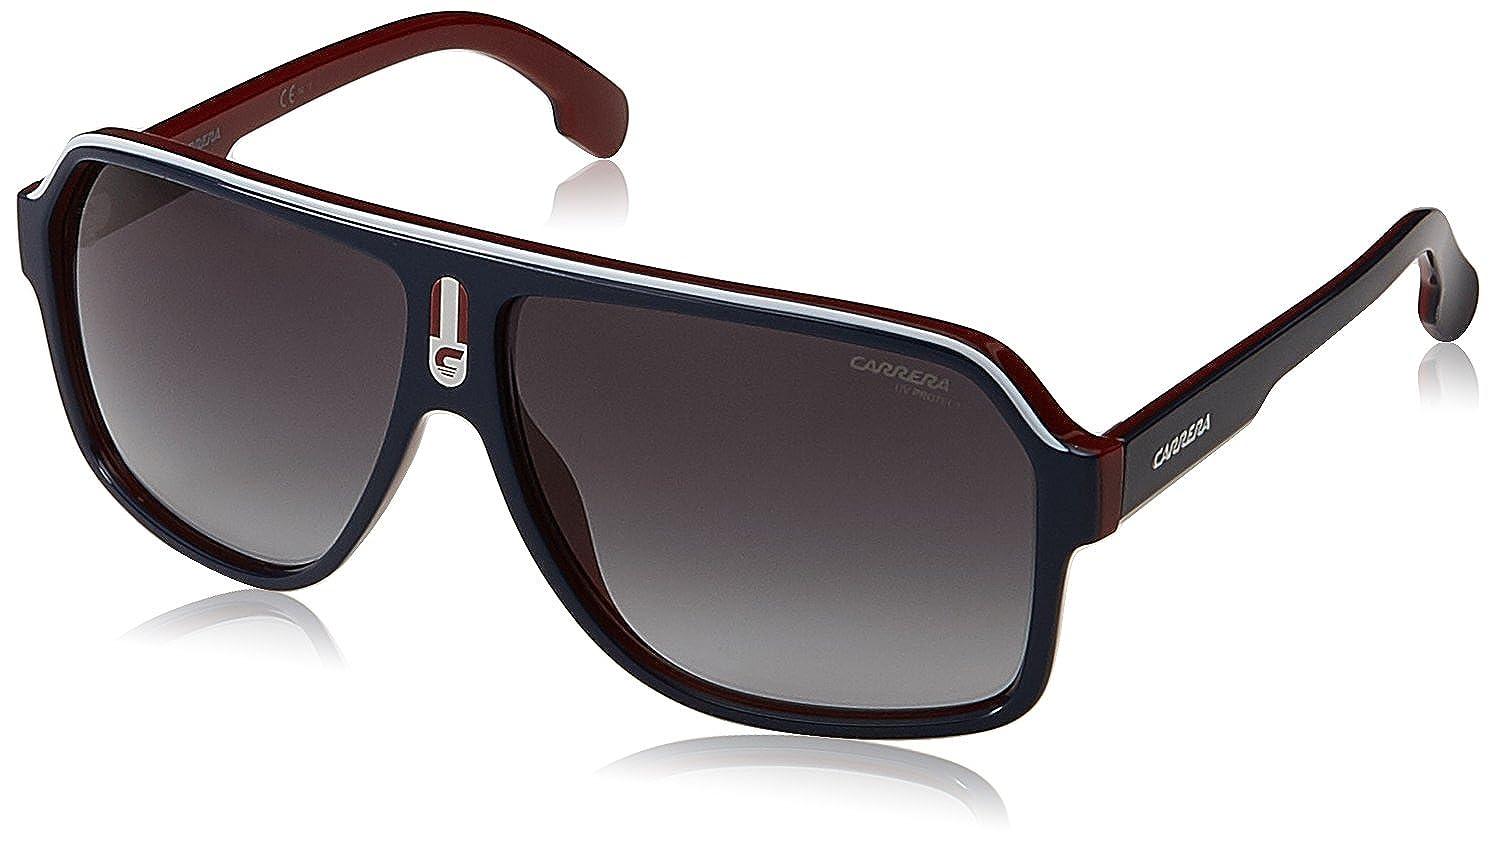 ab8db347b78 Carrera Gradient Square Unisex Sunglasses - (CARRERA 1001 S 8RU 629O ...